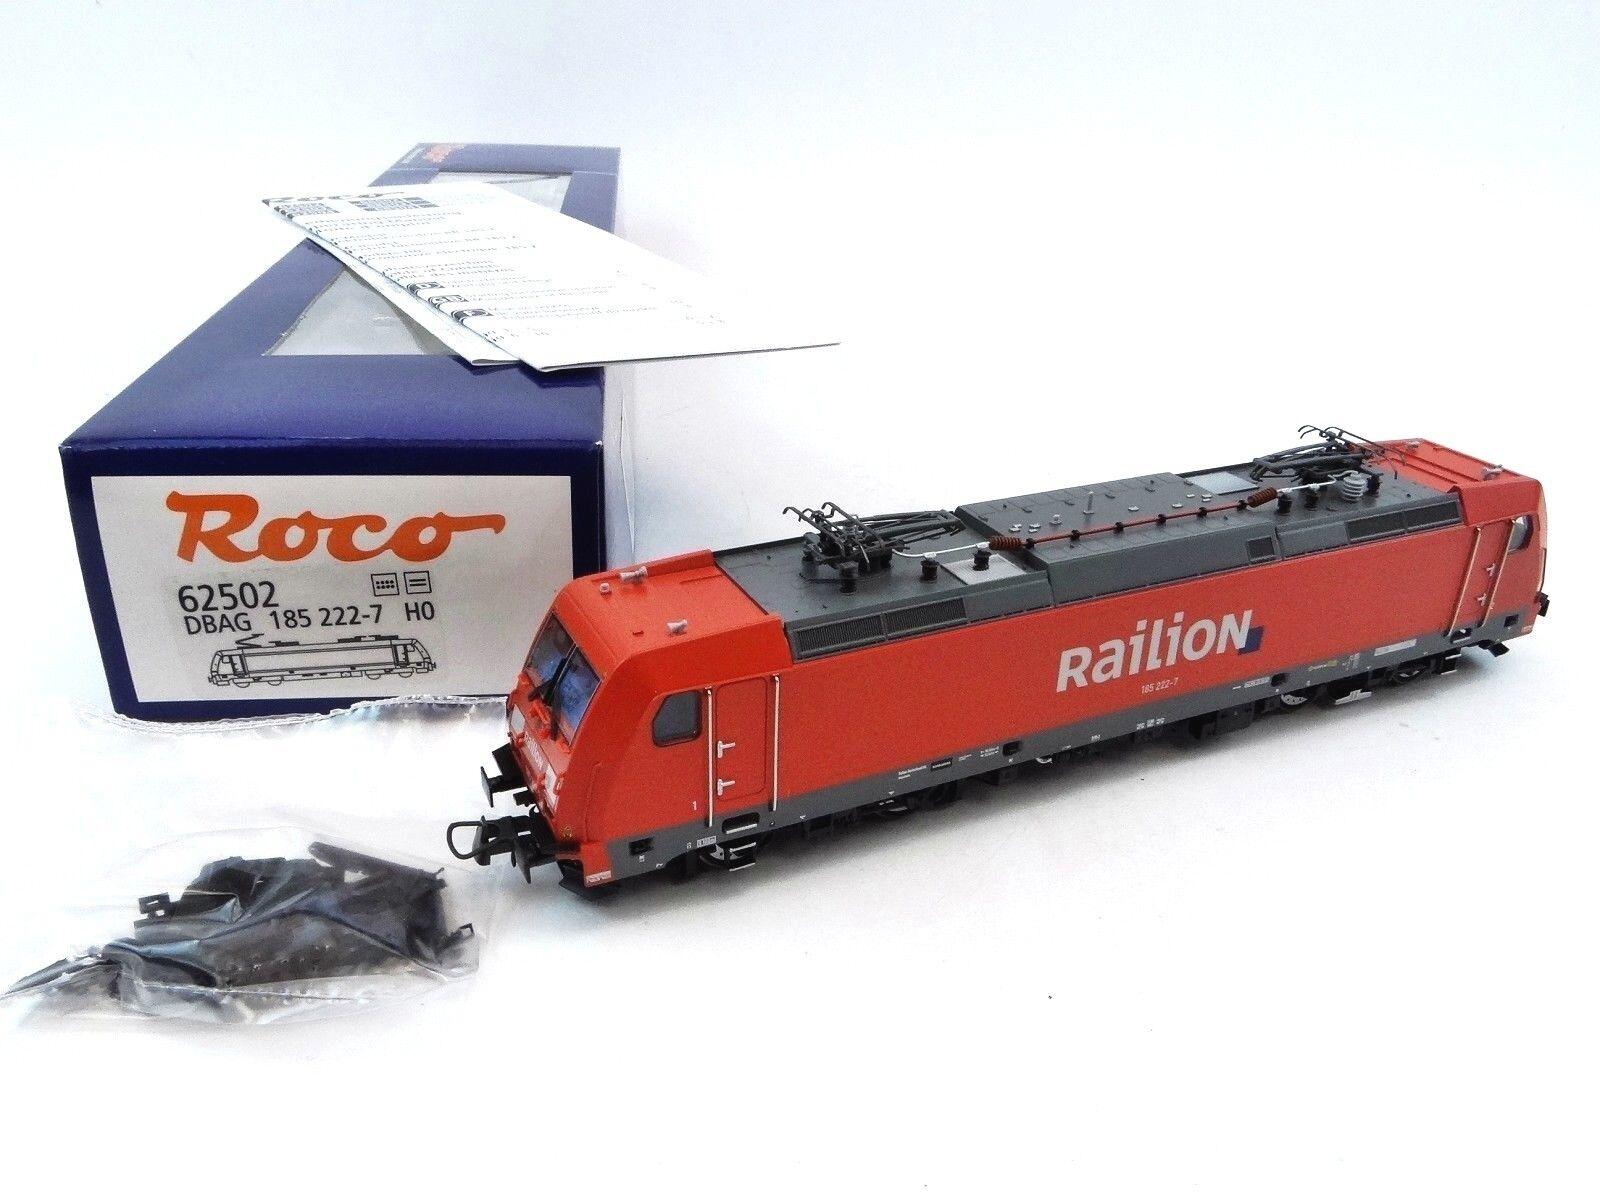 ROCO 62502 E-Lok BR 185 222-7 DB-AG Railion TRAXX p160 ac2 DC DSS analogico h0